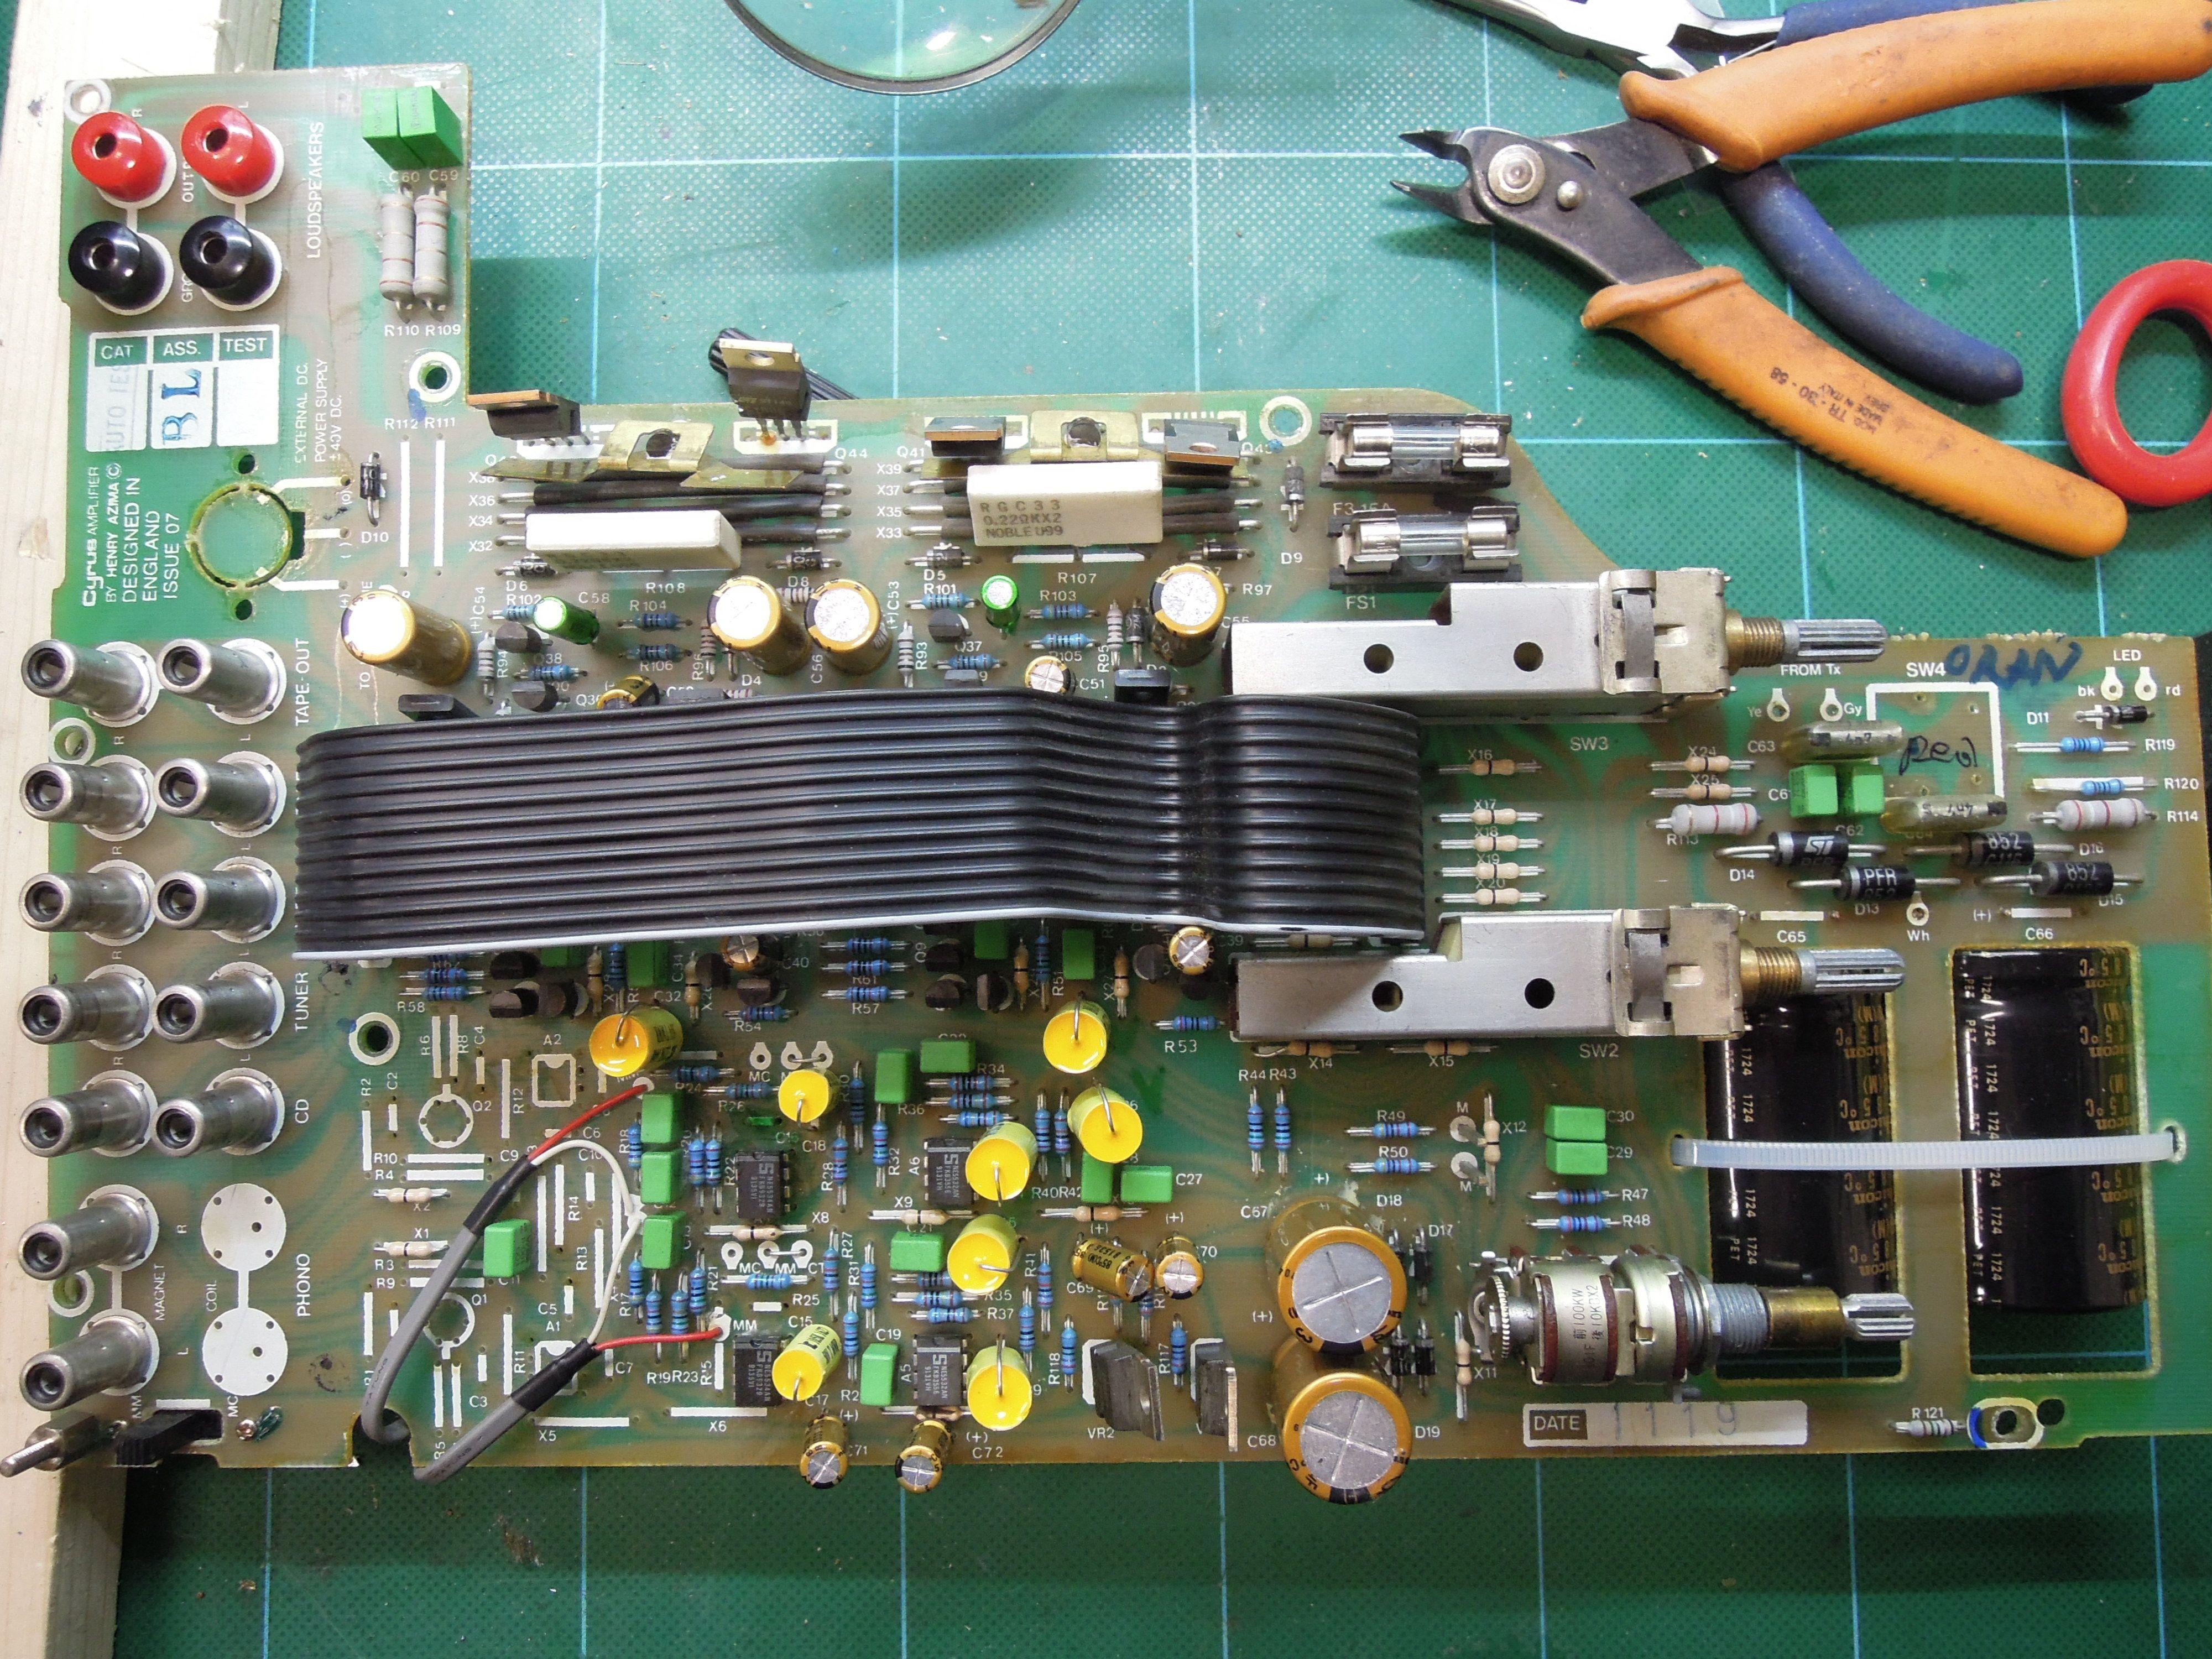 Schemi Elettrici Hi Fi : Mission cyrus upgrade restoring vintage hifi repair